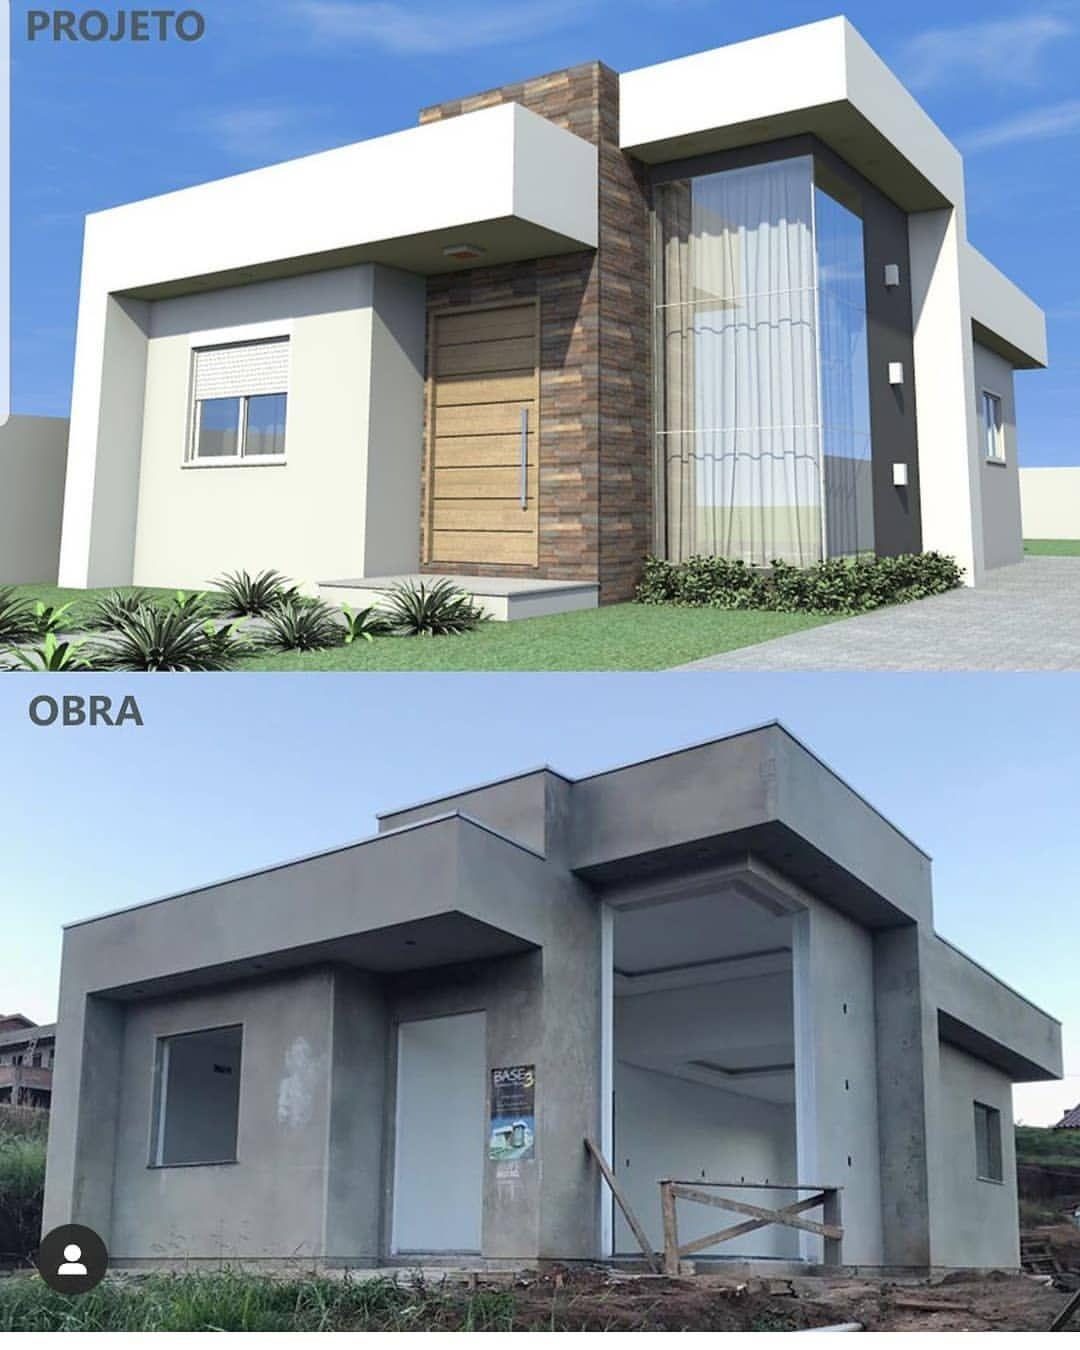 58ffd3111904c5919c5cf0d4c90dc8f9 - 33+ Village Small House Front Design  Pictures